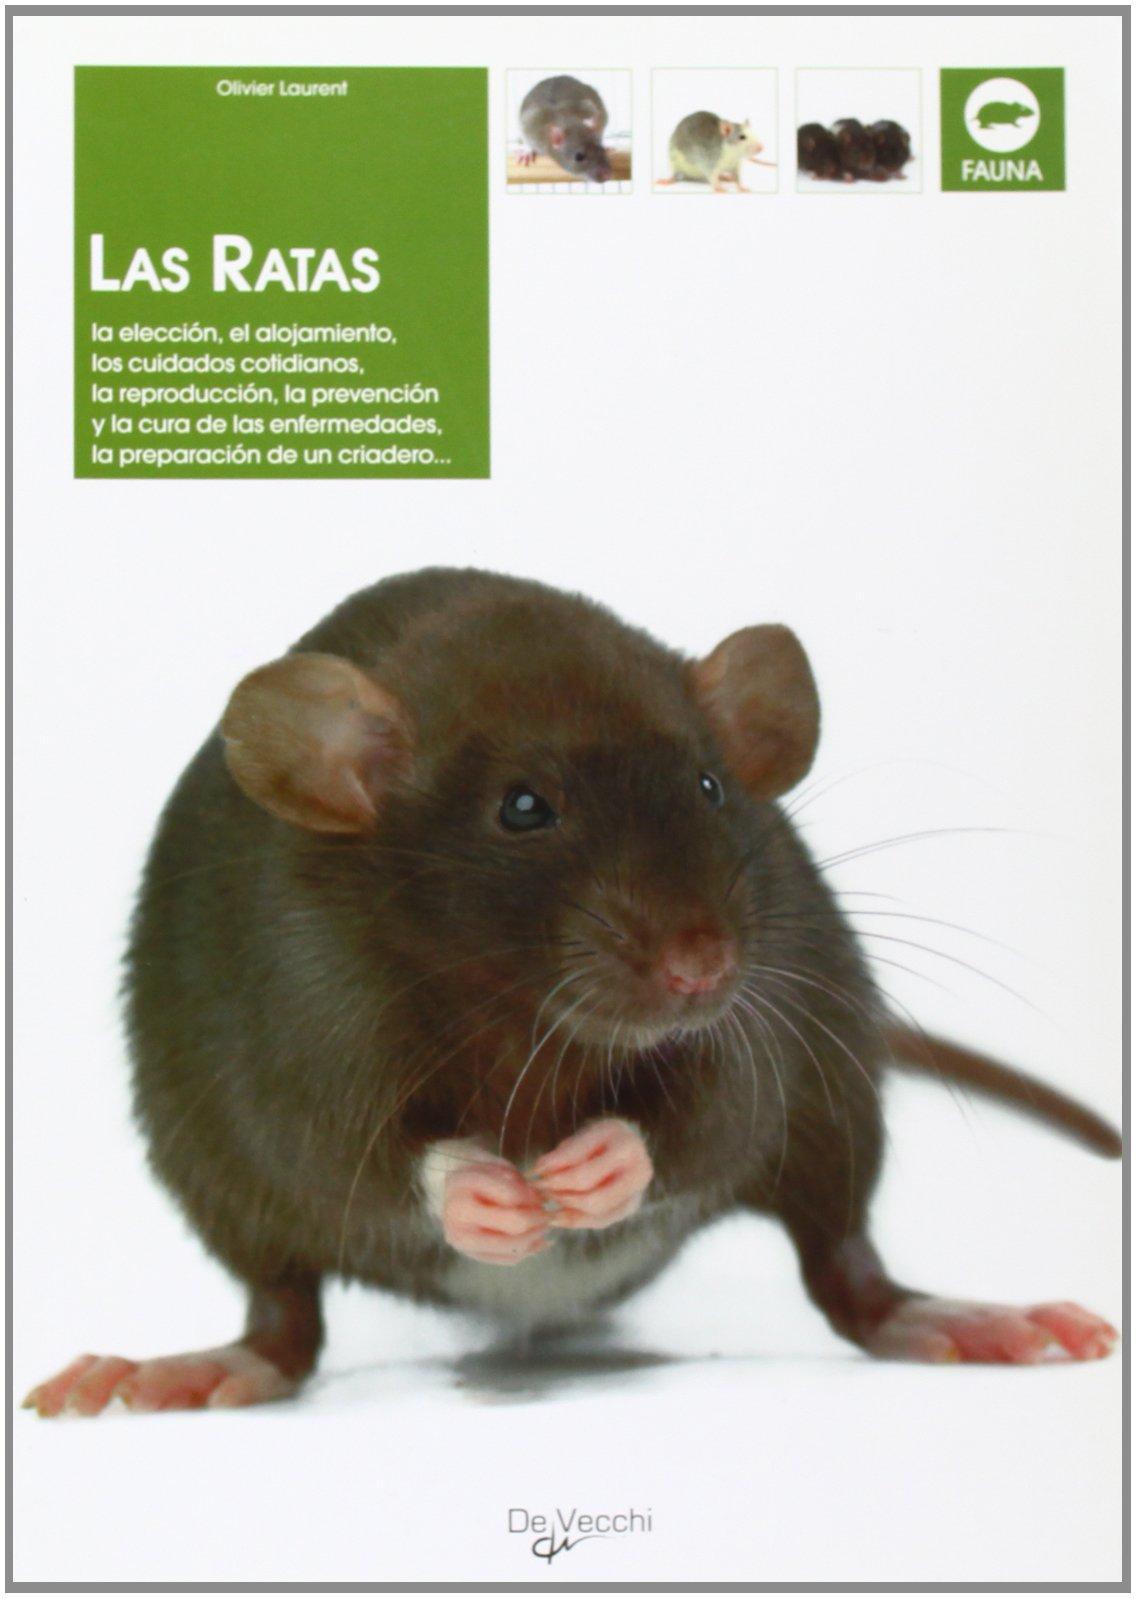 Las ratas (Animales): Amazon.es: Olivier Laurent: Libros